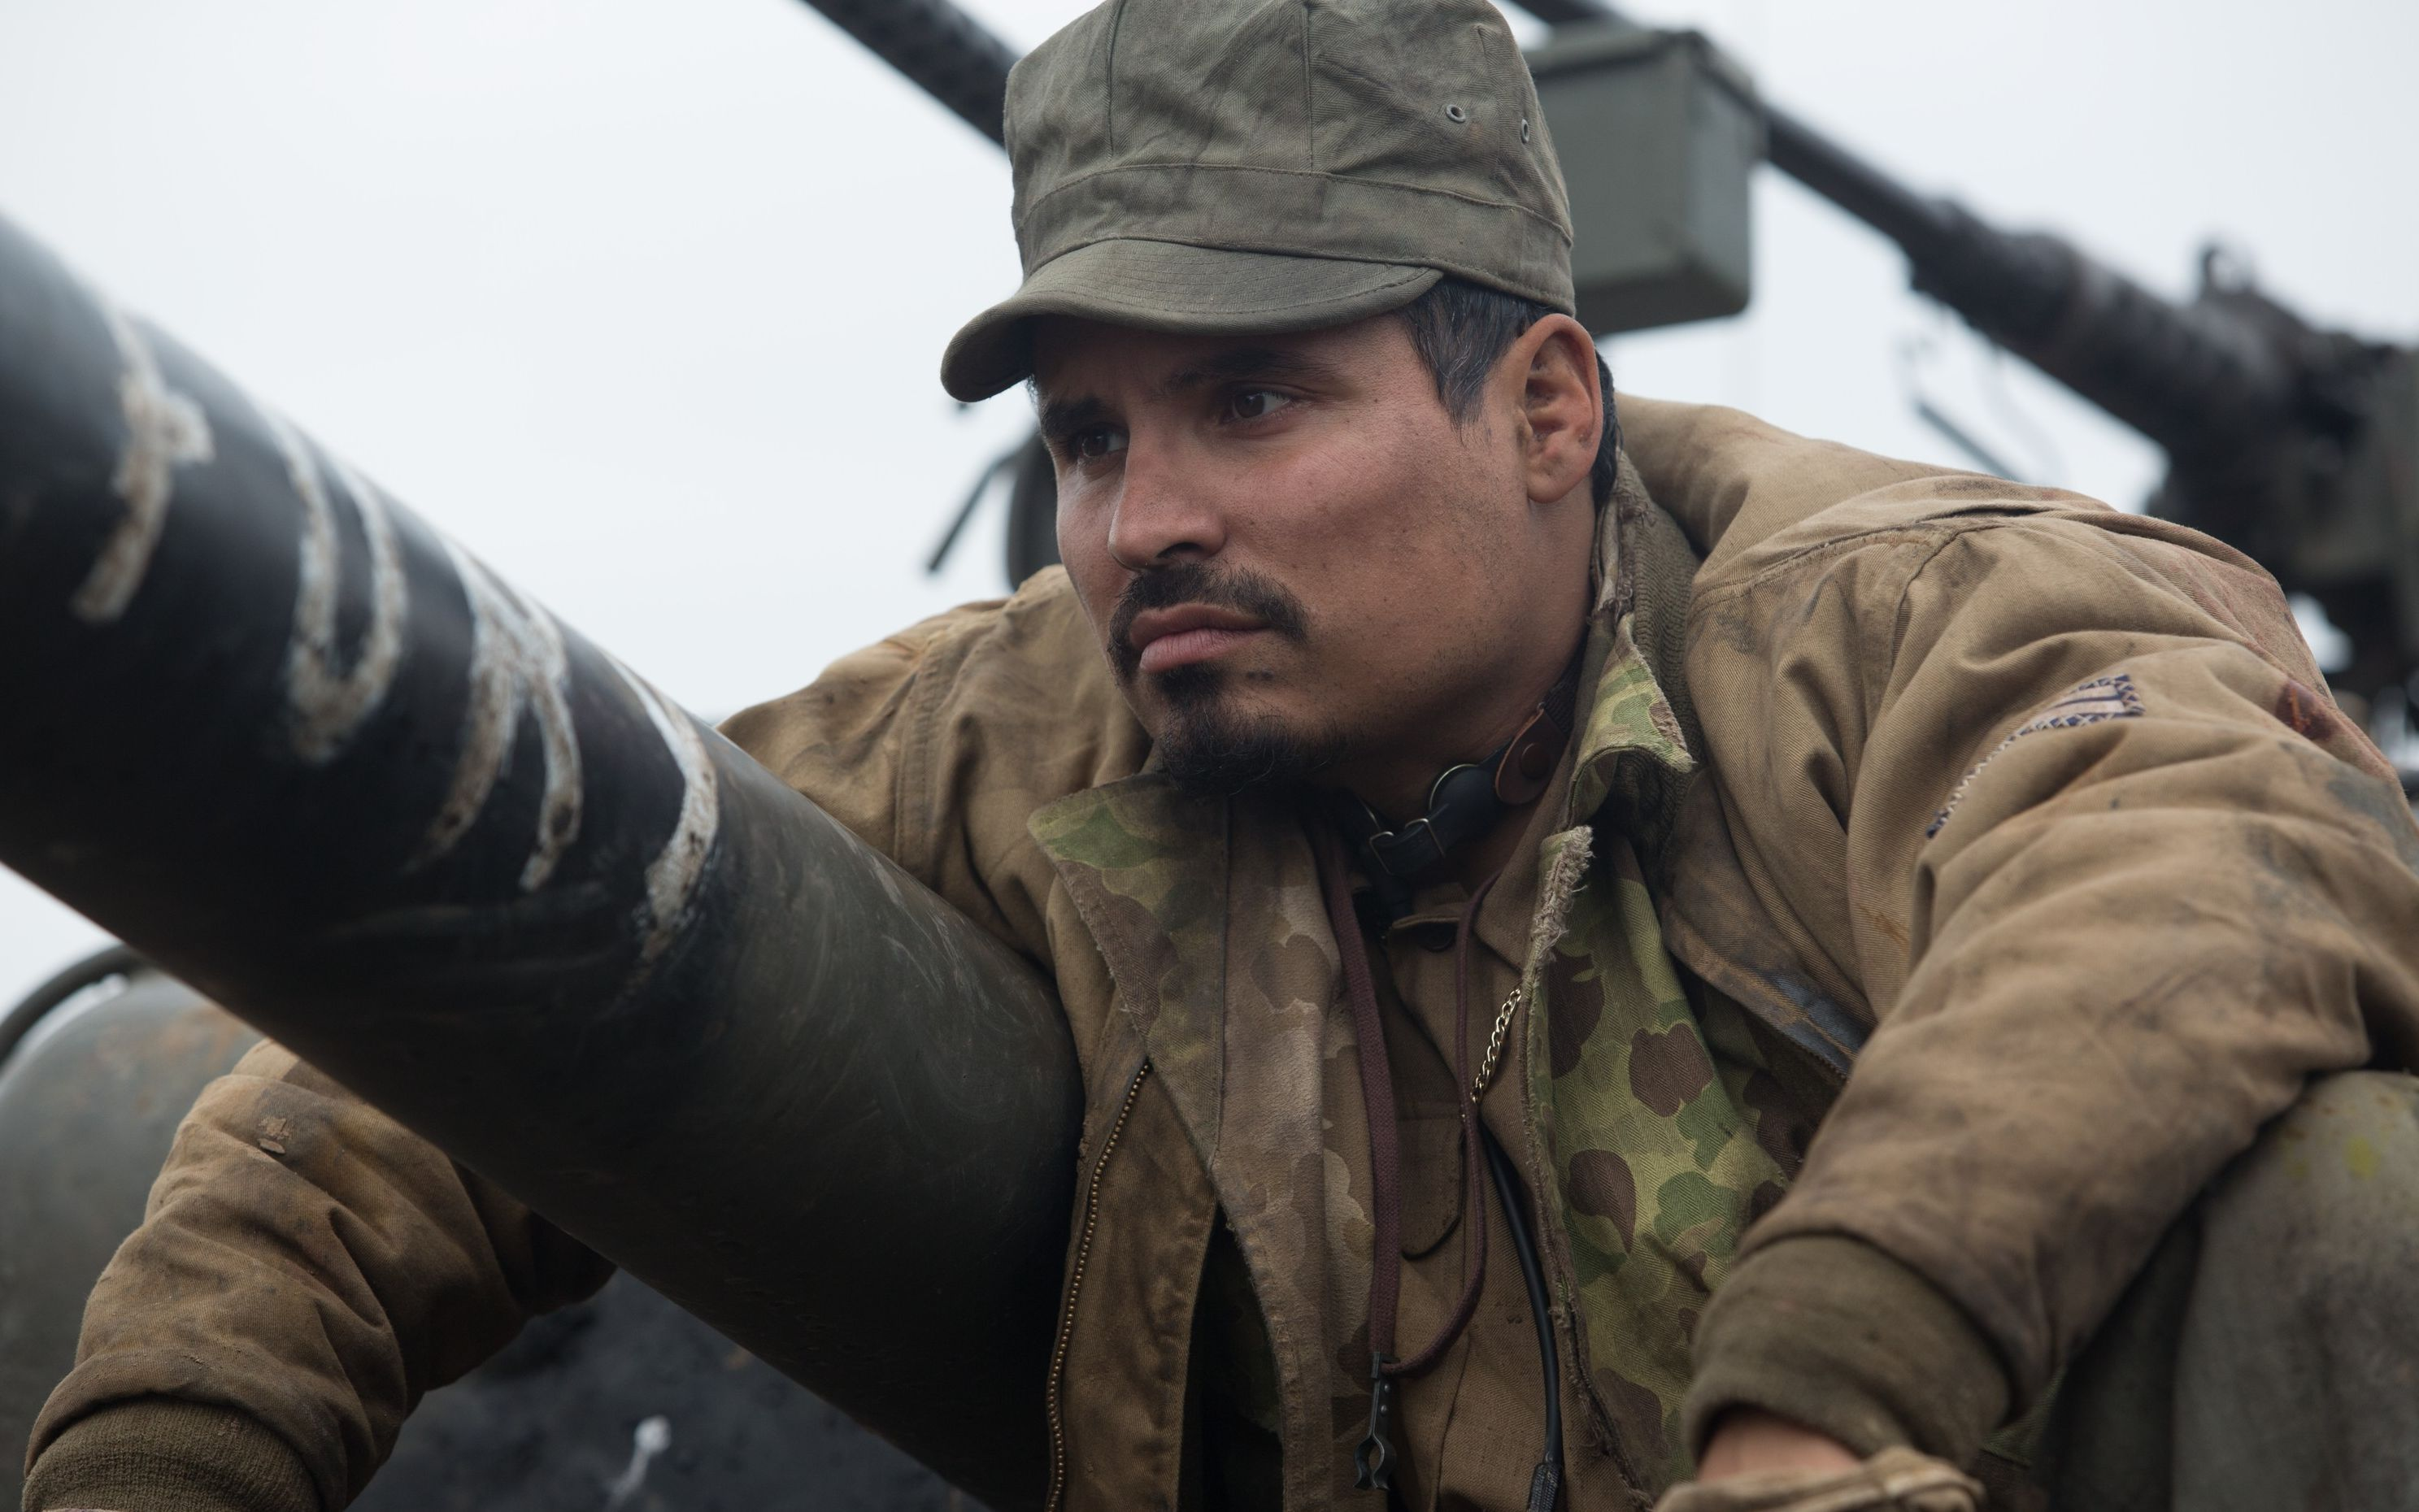 Michael Pena close-up as Gordo Trini Garcia in Fury